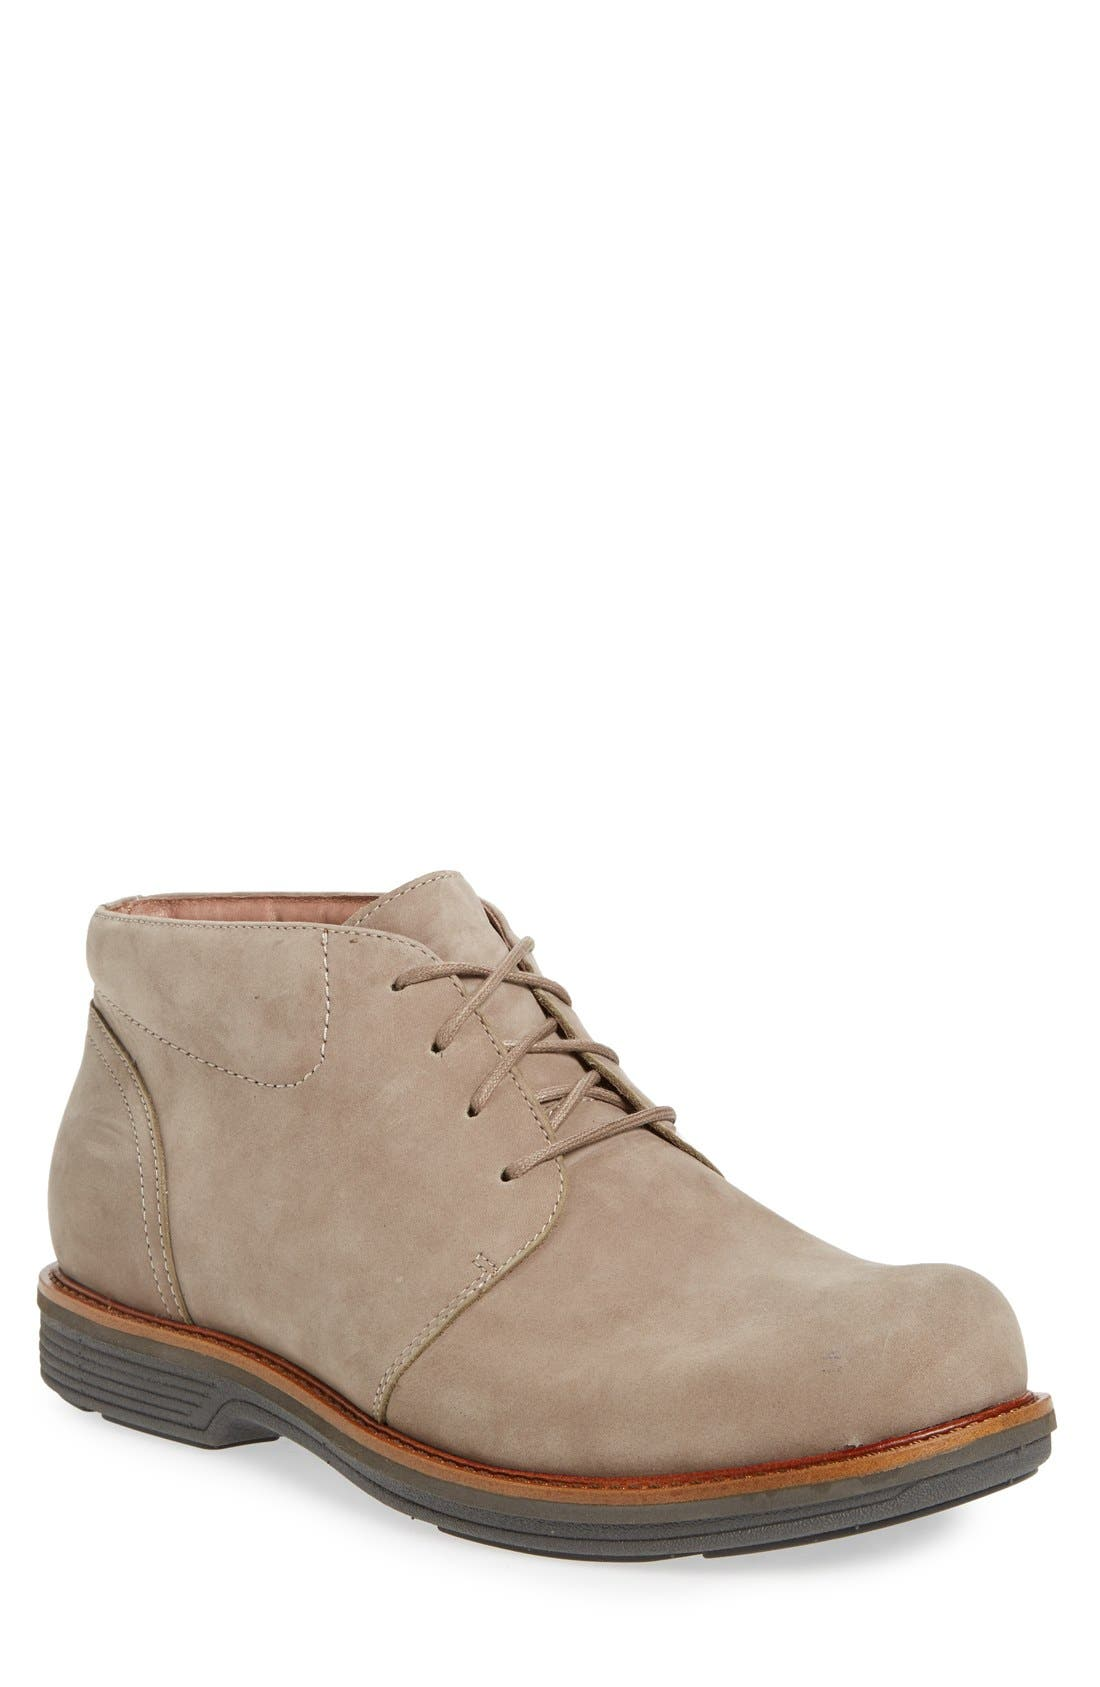 'Jake' Chukka Boot,                             Main thumbnail 1, color,                             Taupe Milled Nubuck Leather